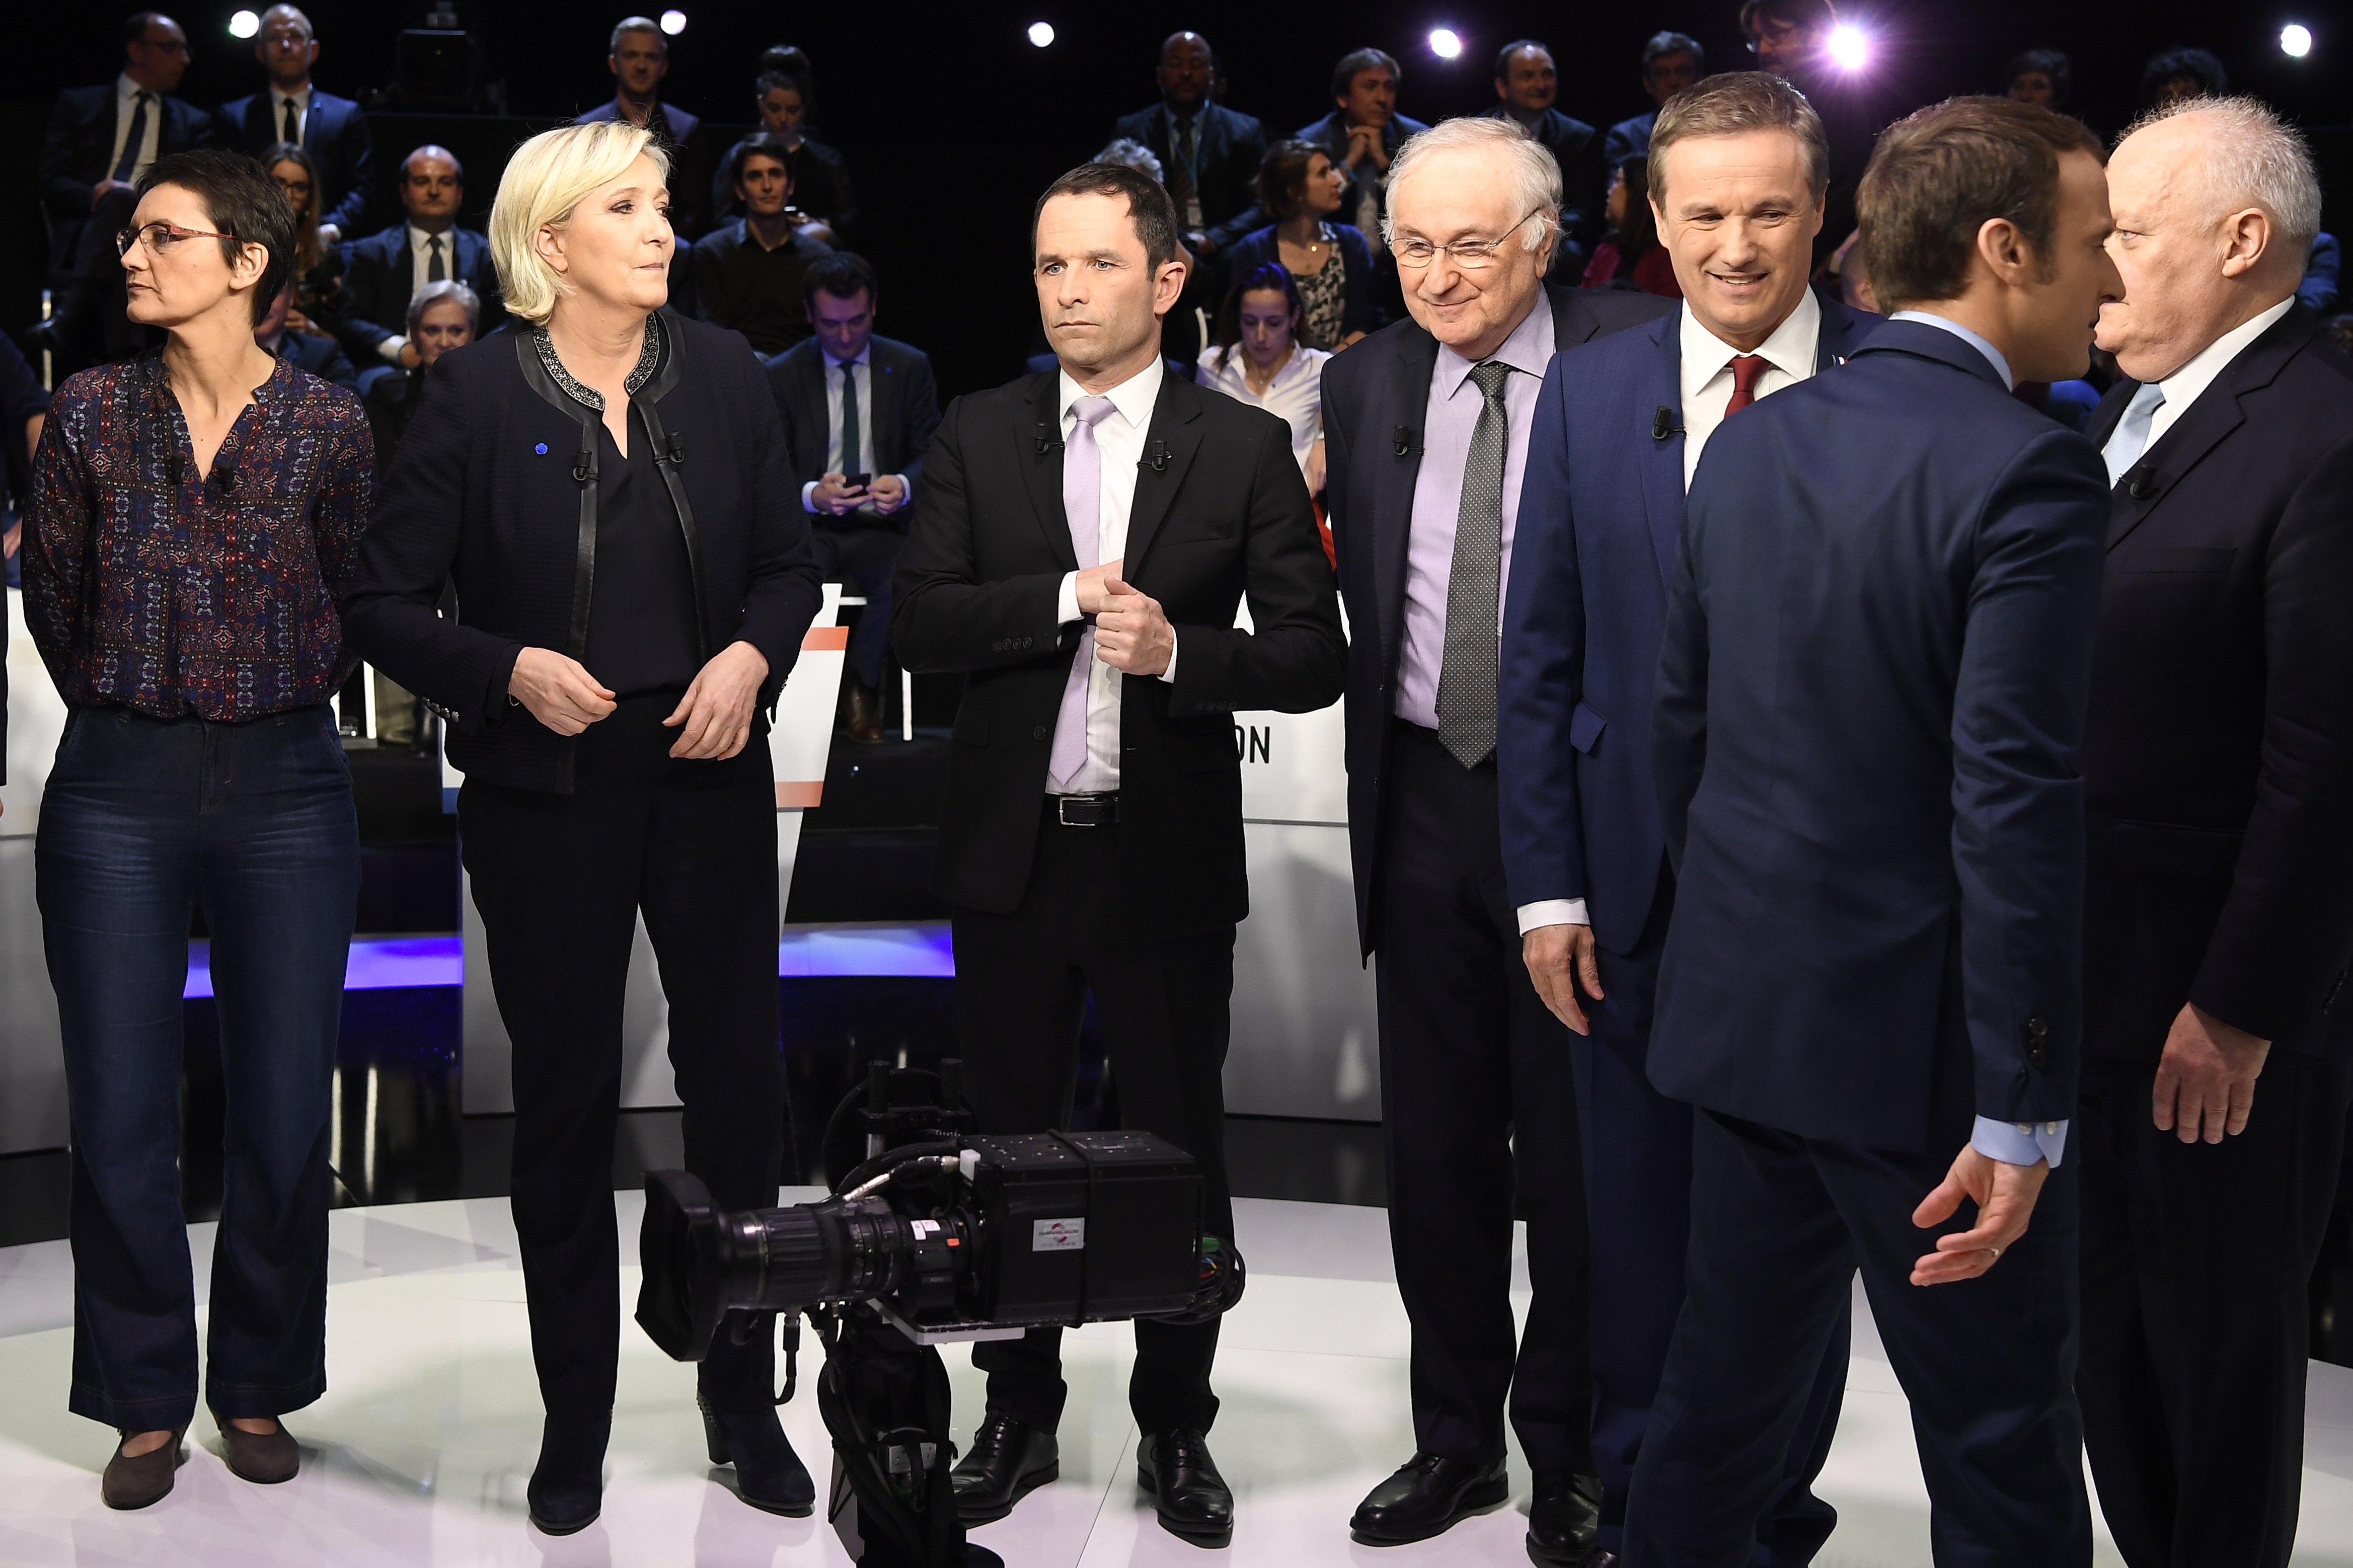 Raste podrška Marini Le Pen nakon pariškog napada, no Macron pobjeđuje